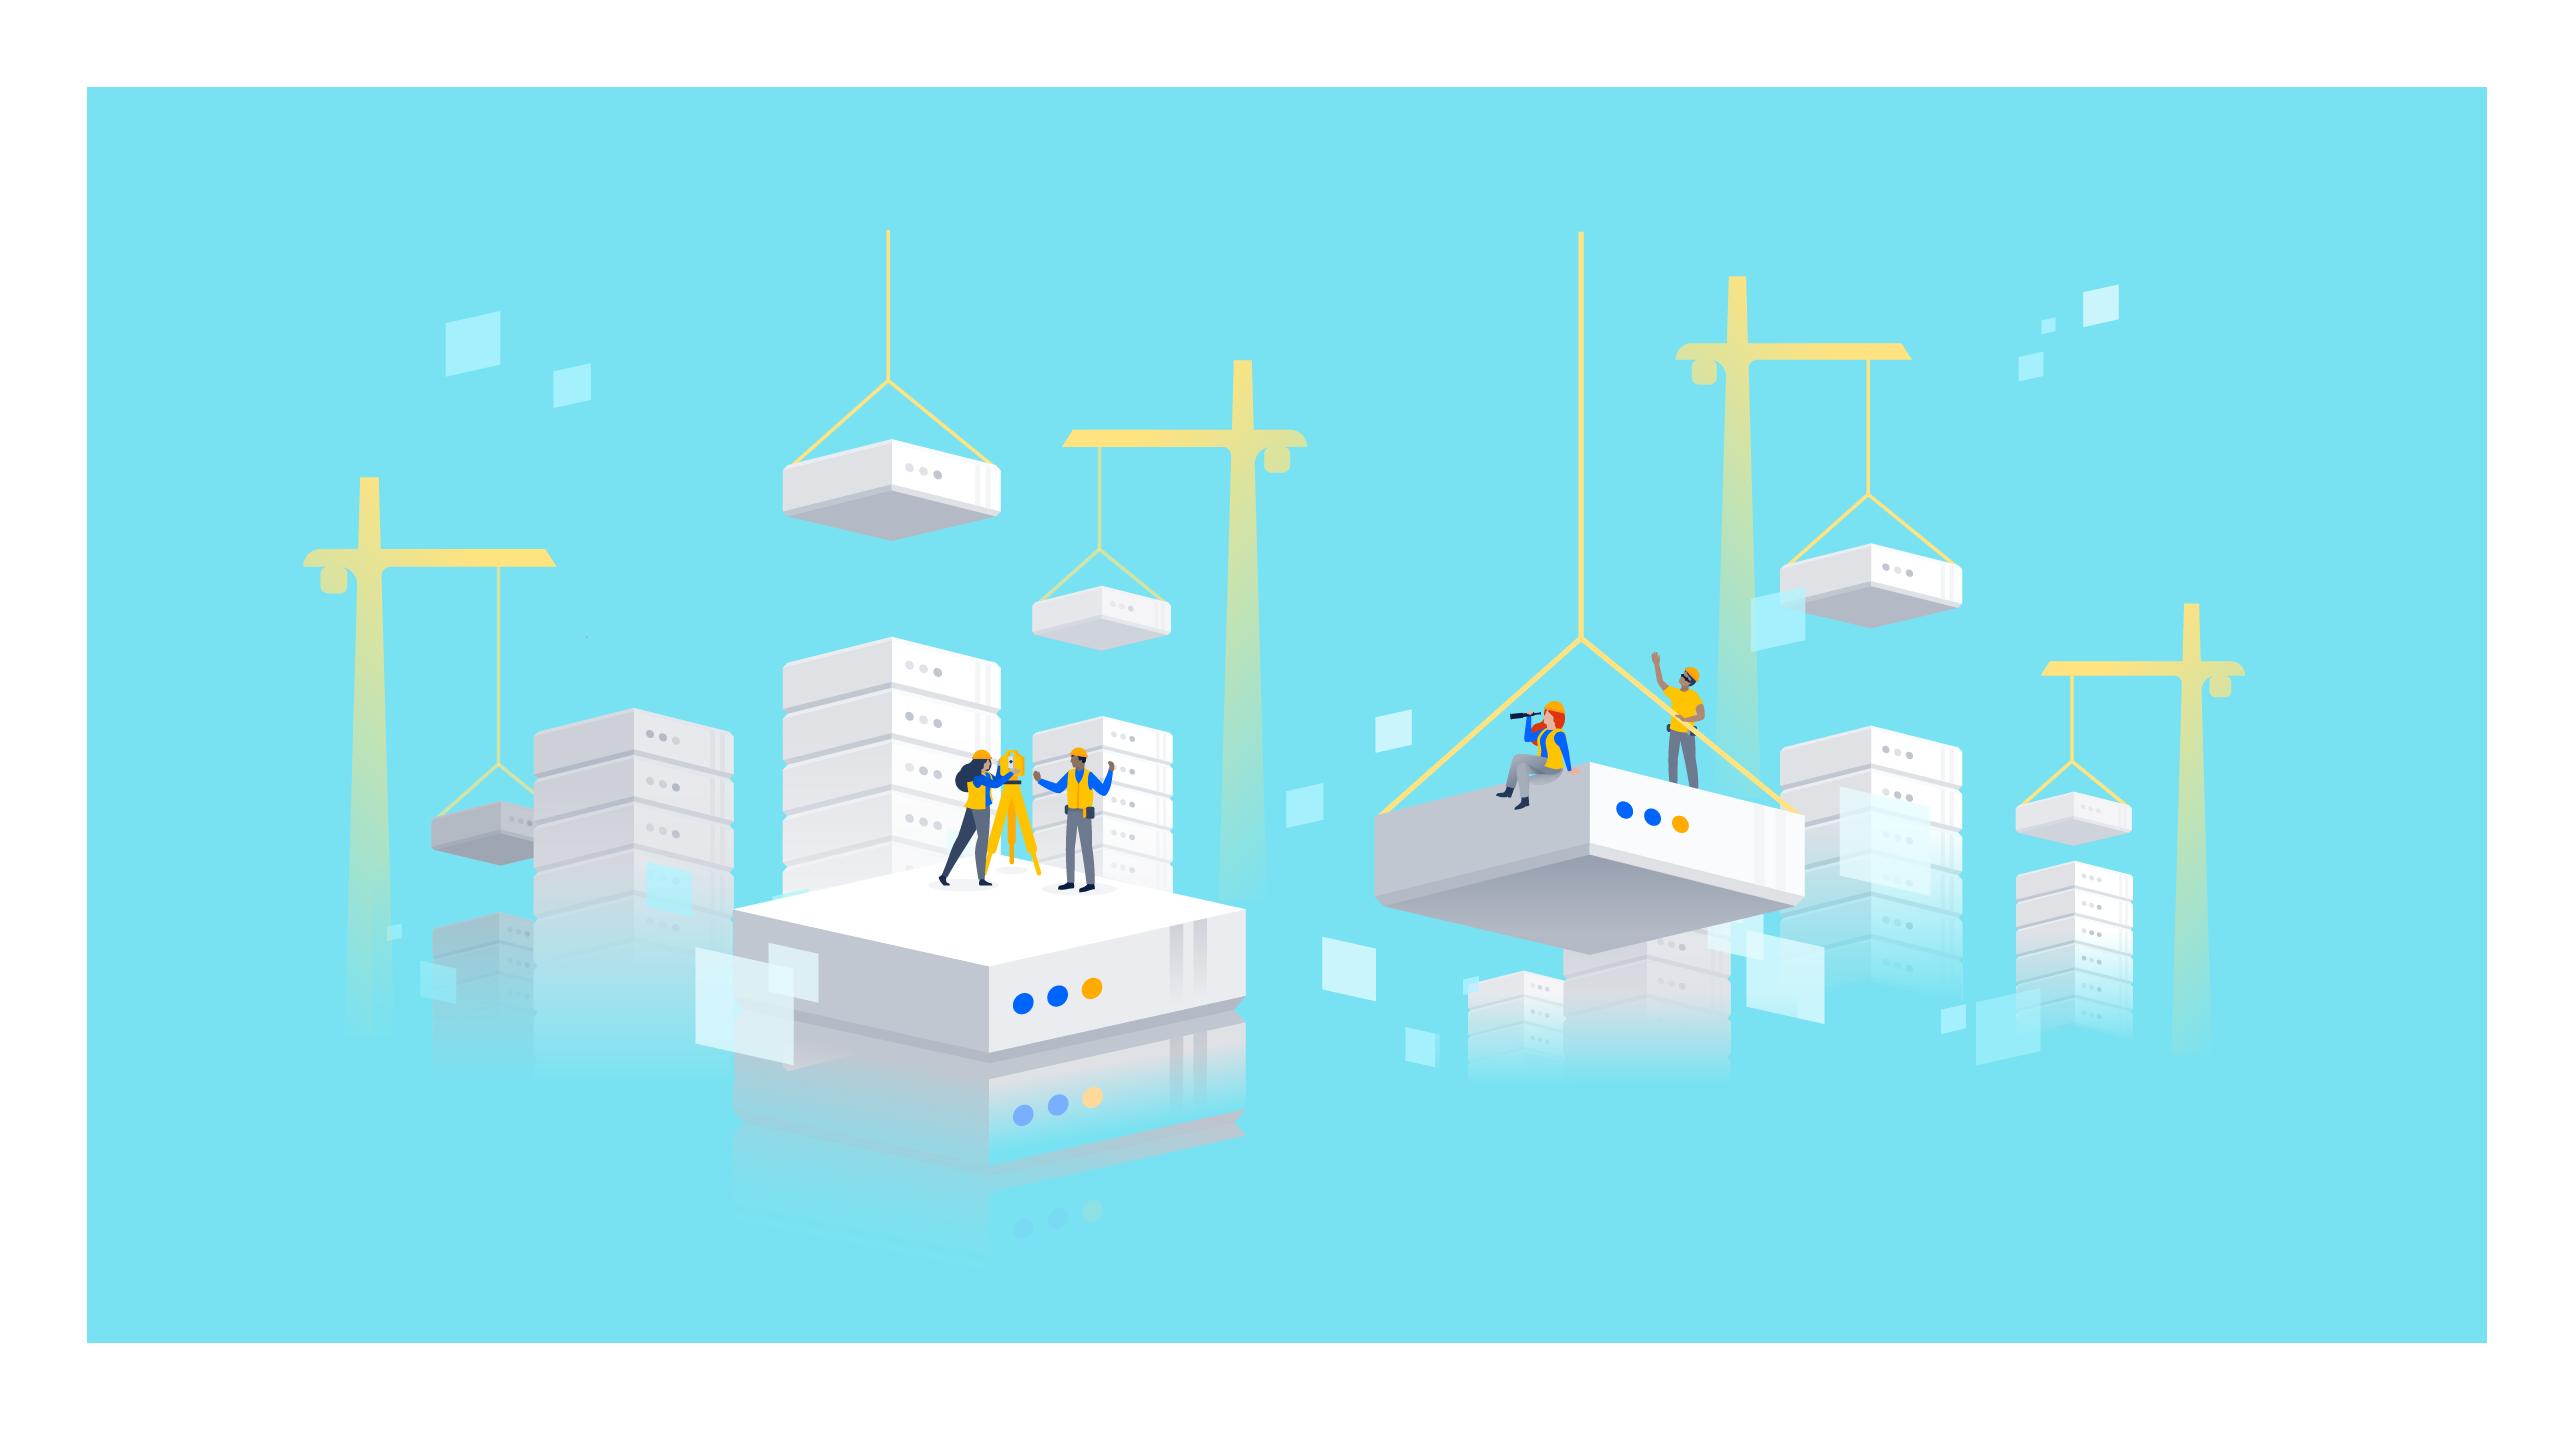 Construction site with jira server blocks illustration